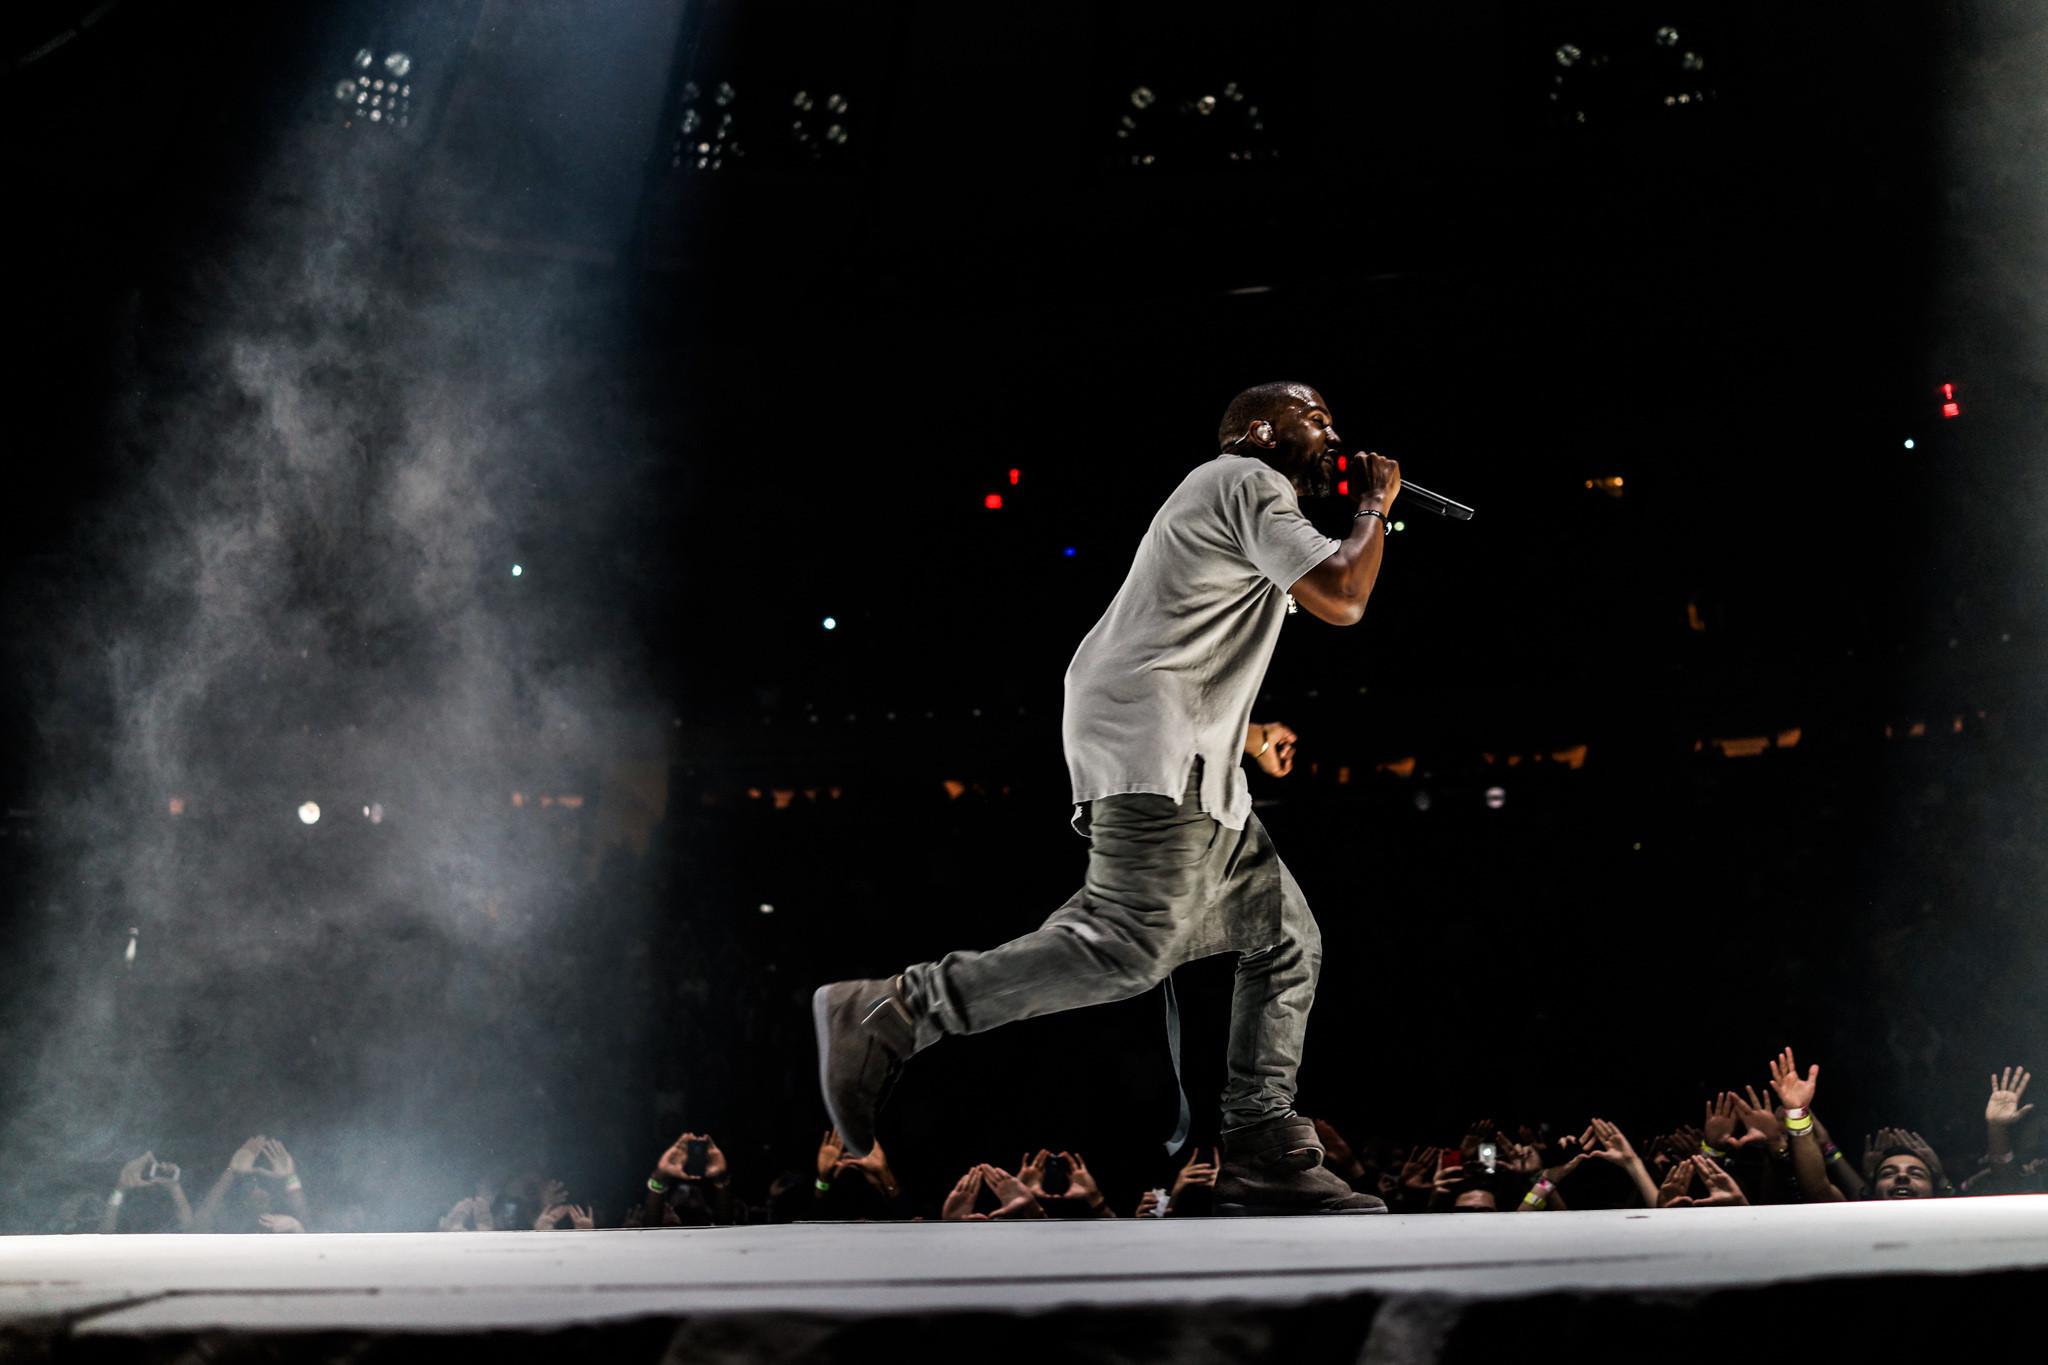 HD YEEZUS Tour Wallpapers (Desktop & Phone) [UPDATED!!] Â« Kanye West Forum